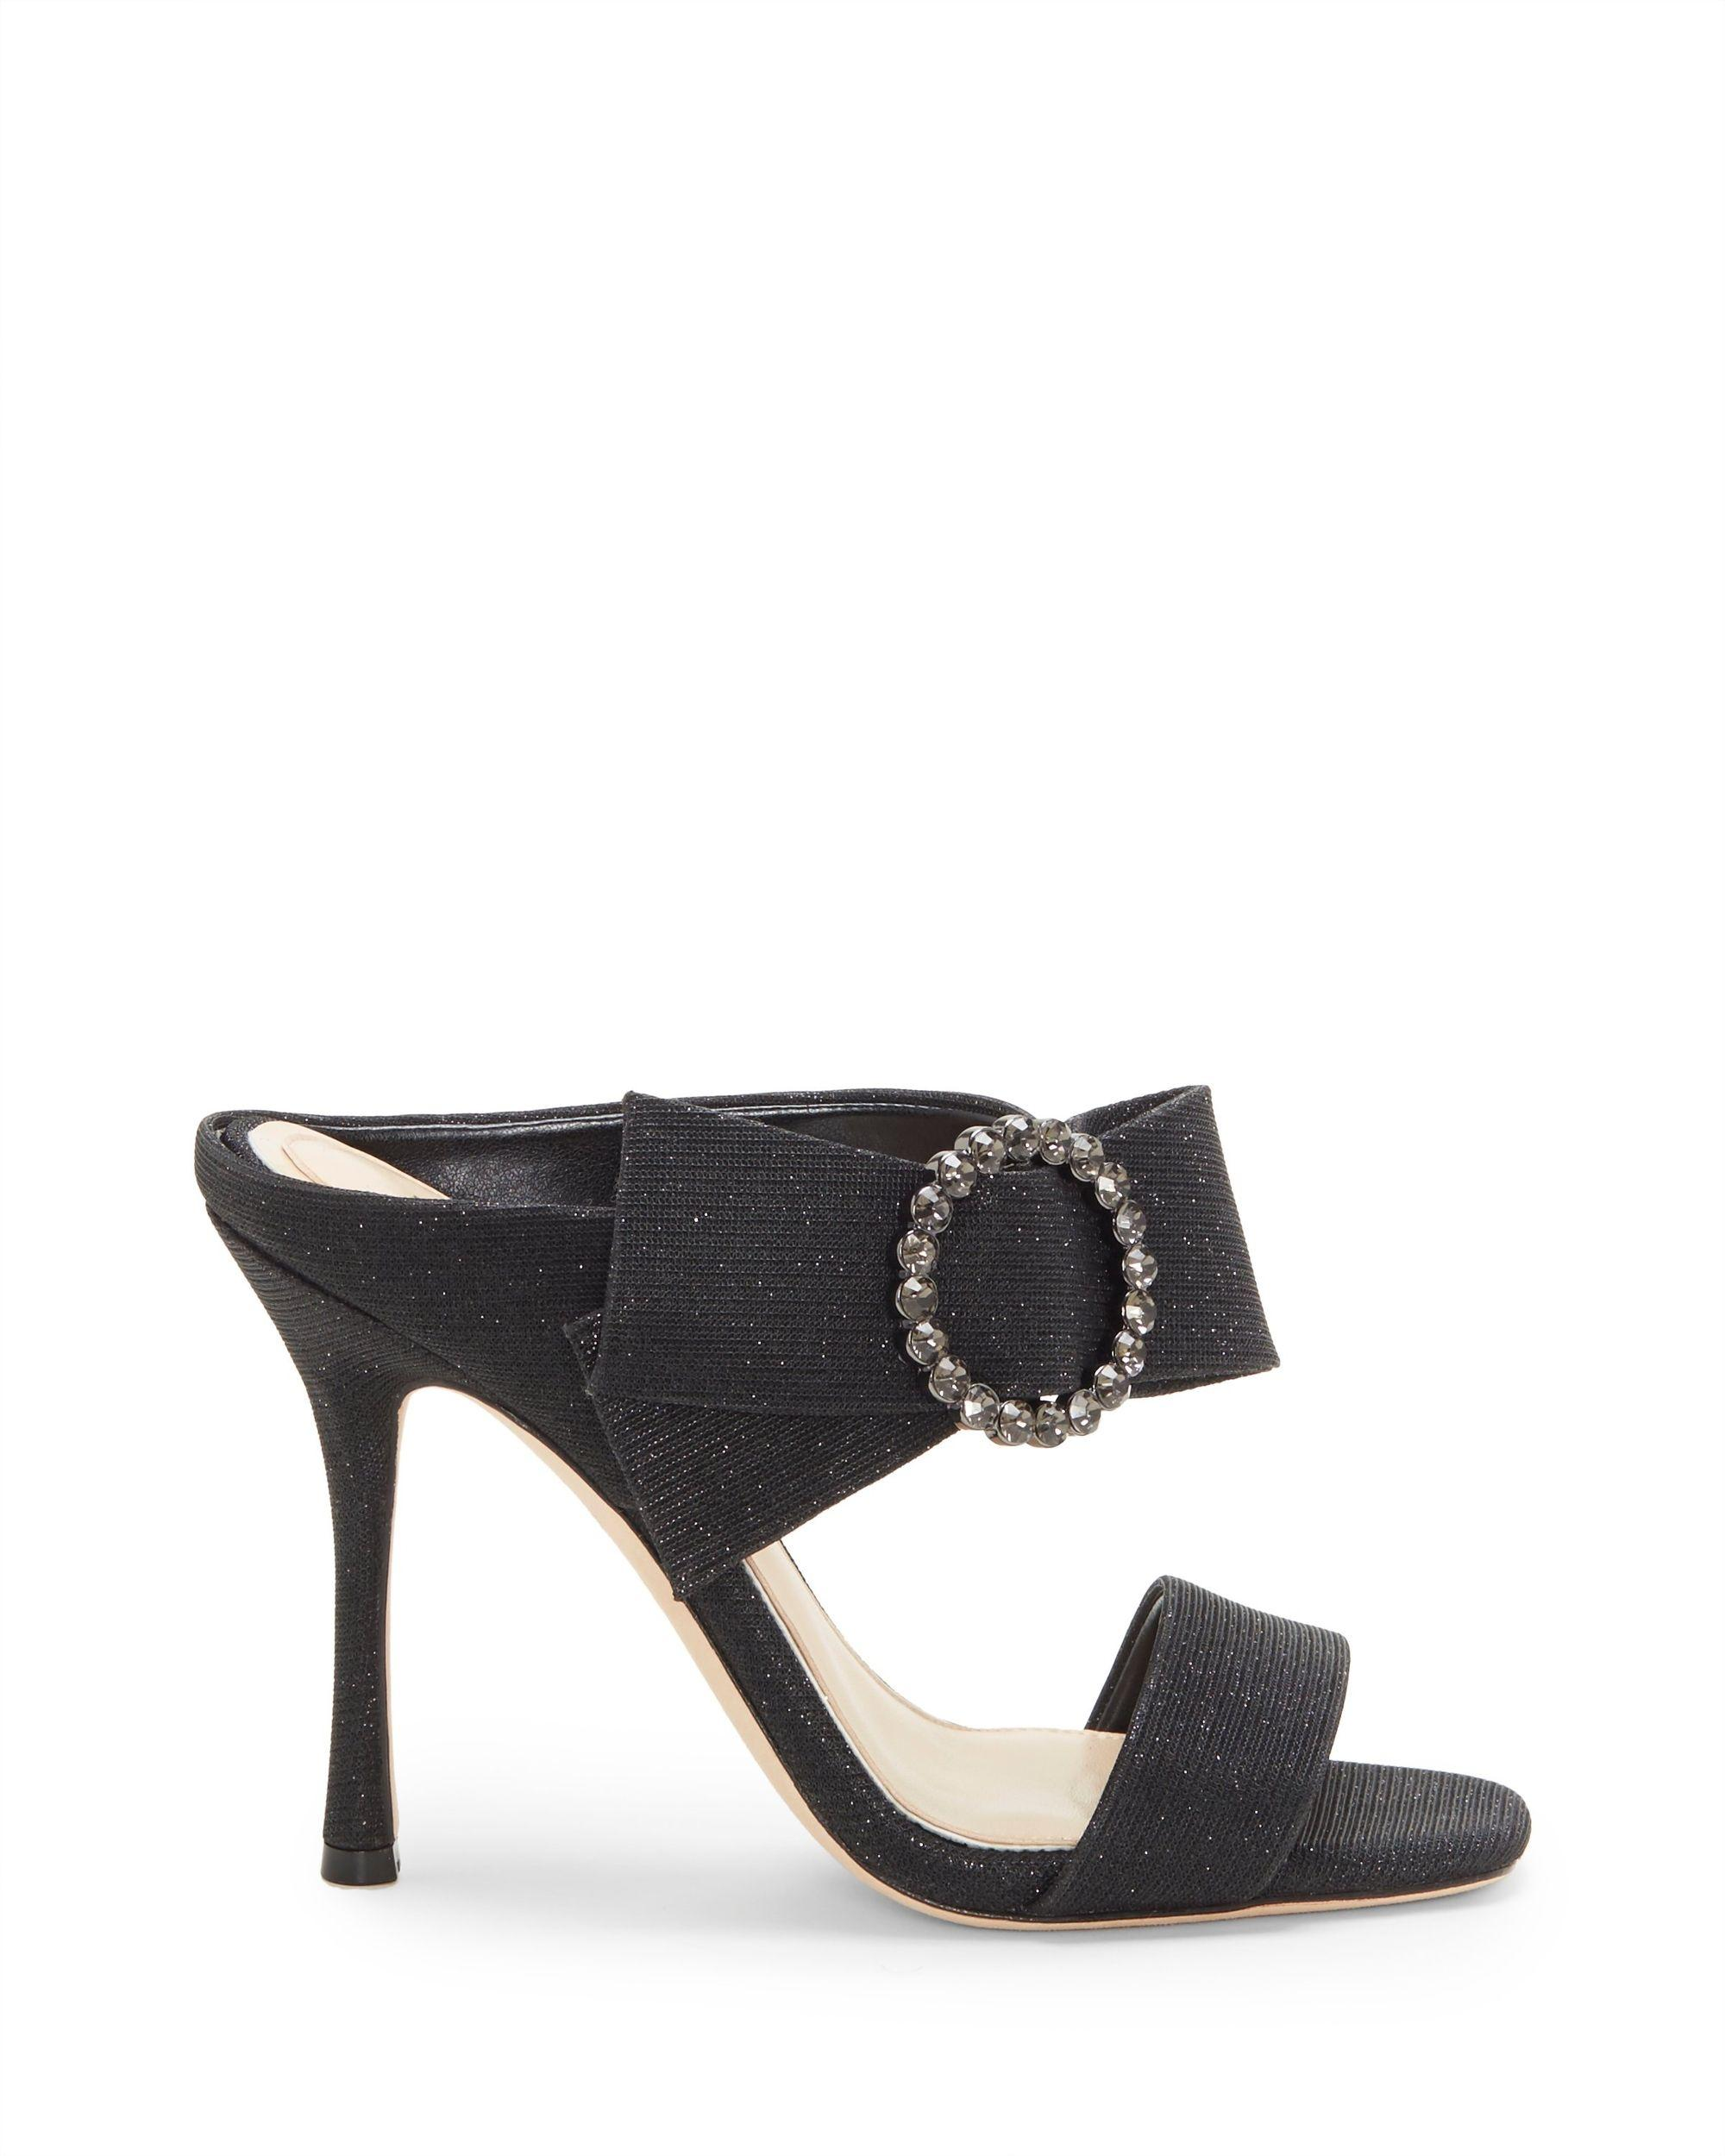 1d8b5d507fd Lyst - Vince Camuto Imagine Westcott – Embellished Dress Mule in Black -  Save 14%